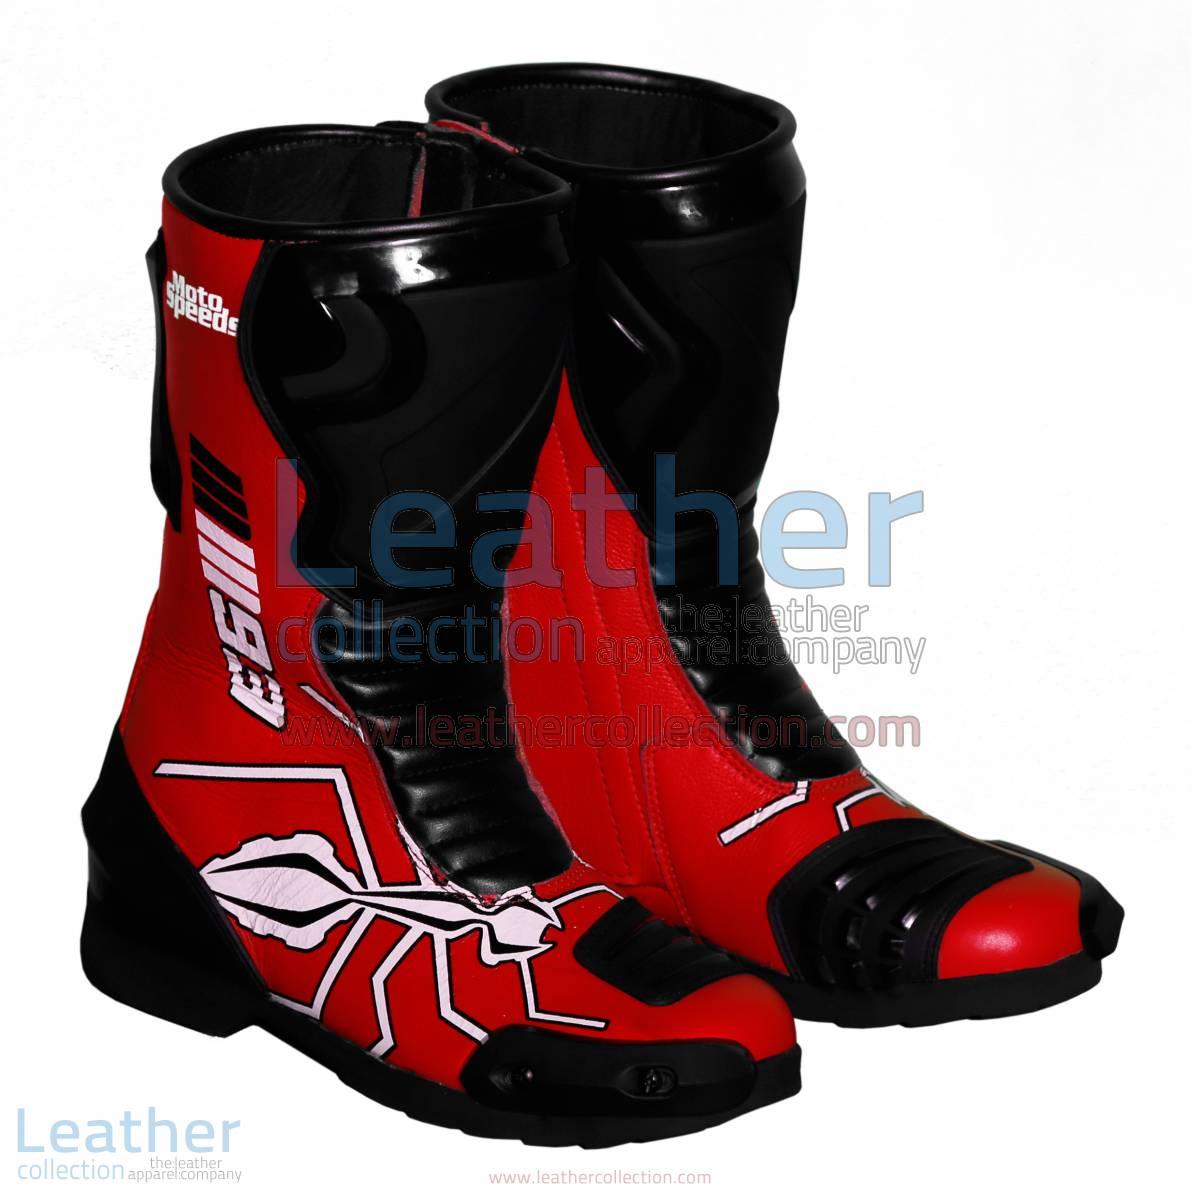 Marc Marquez 2015 - 2016 MotoGP Racing Boots   Marc Marquez 2015 - 2016 MotoGP racing boots